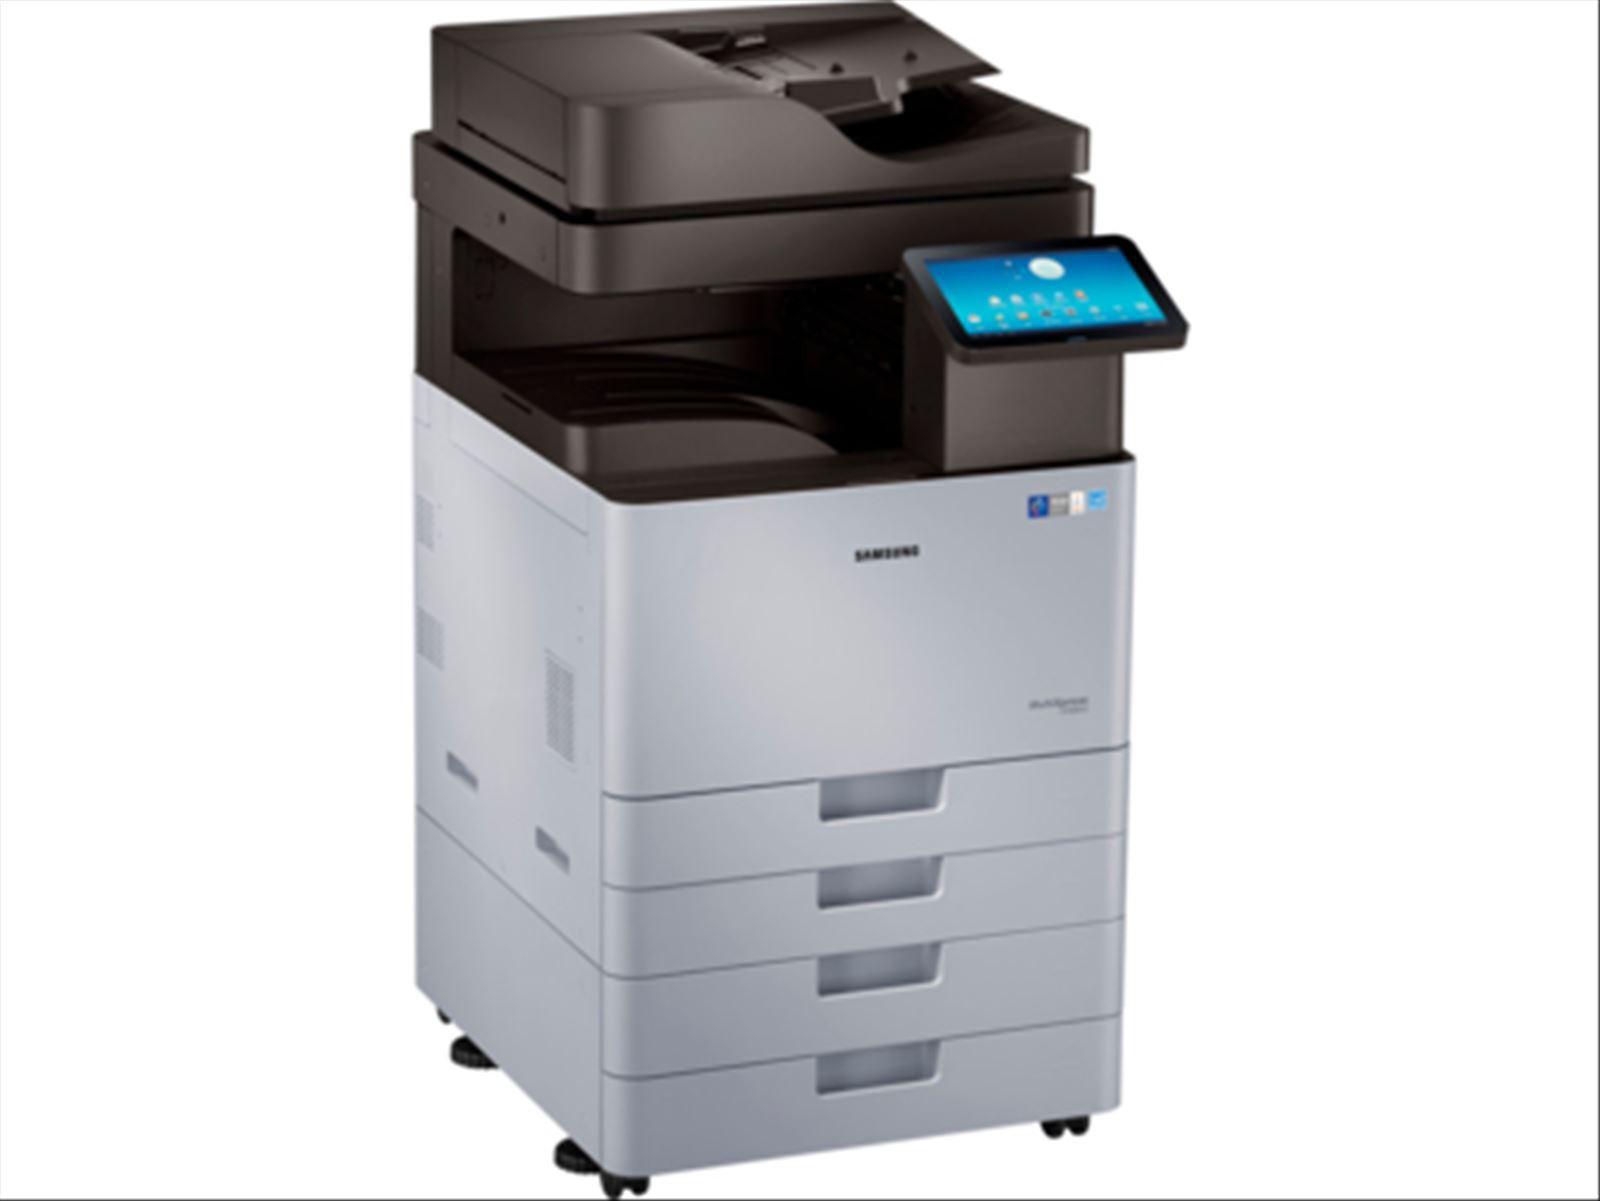 HP SL-K7600LX 1200 x 1200DPI Laser A3 60ppm